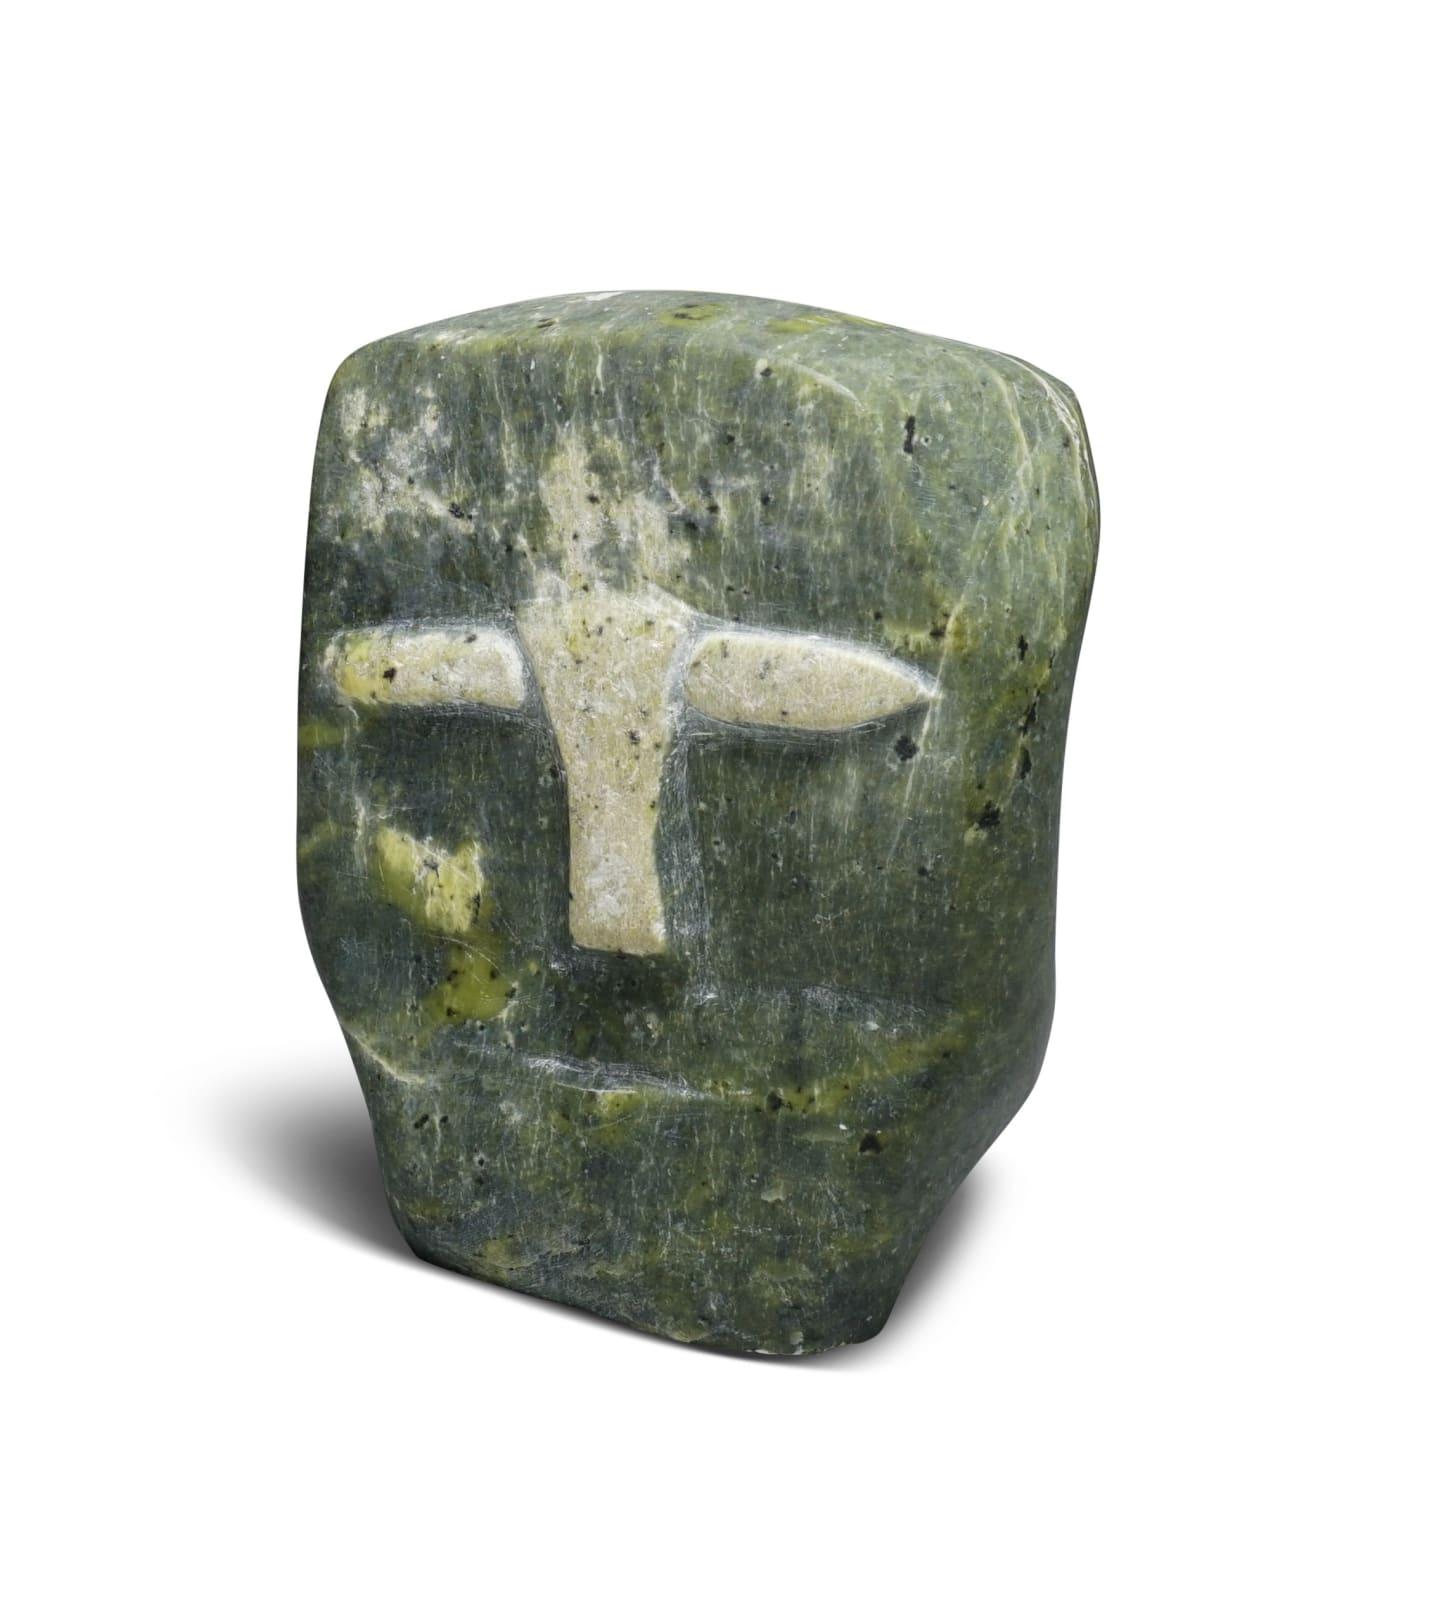 LOT 51 KOVIANITUK ADAMIE (1906-D) IQALUIT (FROBISHER BAY) Head, c. 1975 stone, 5 x 5 x 4 in (12.7 x 12.7 x 10.2 cm) ESTIMATE: $500 — $800 price realized: $480